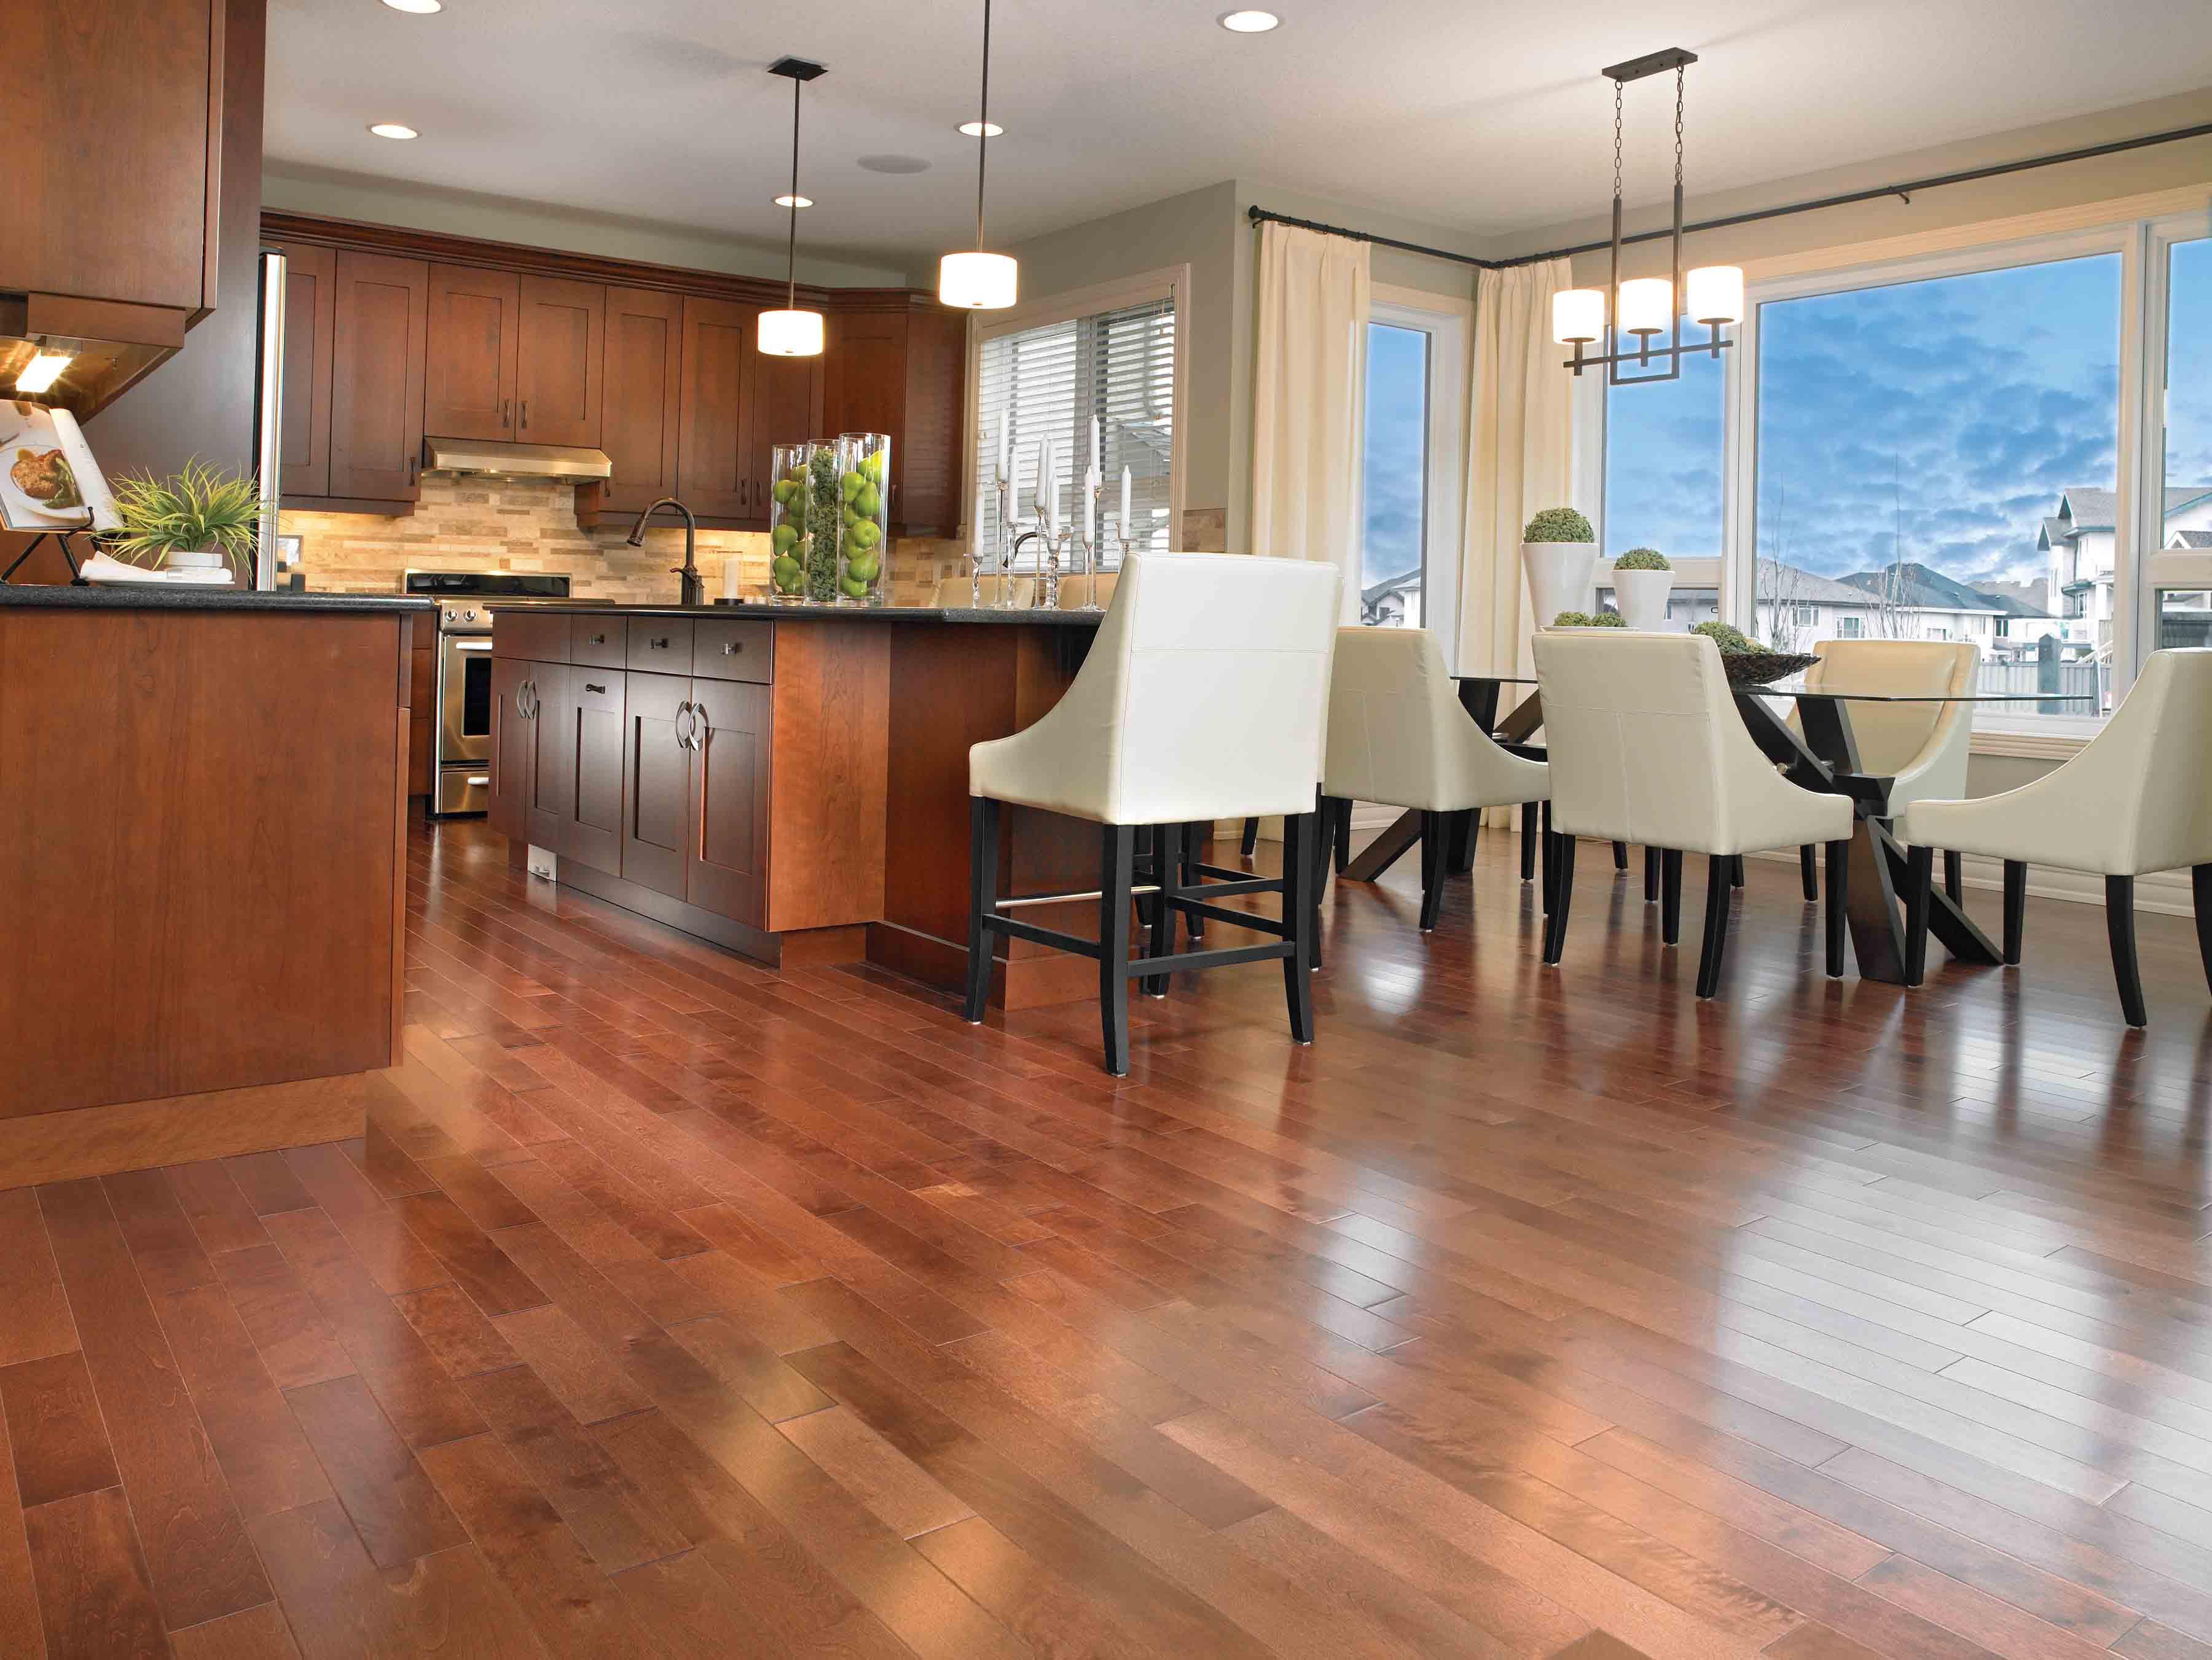 Hardwood floor vs laminate which one is the winner interior hardwood floor dailygadgetfo Image collections